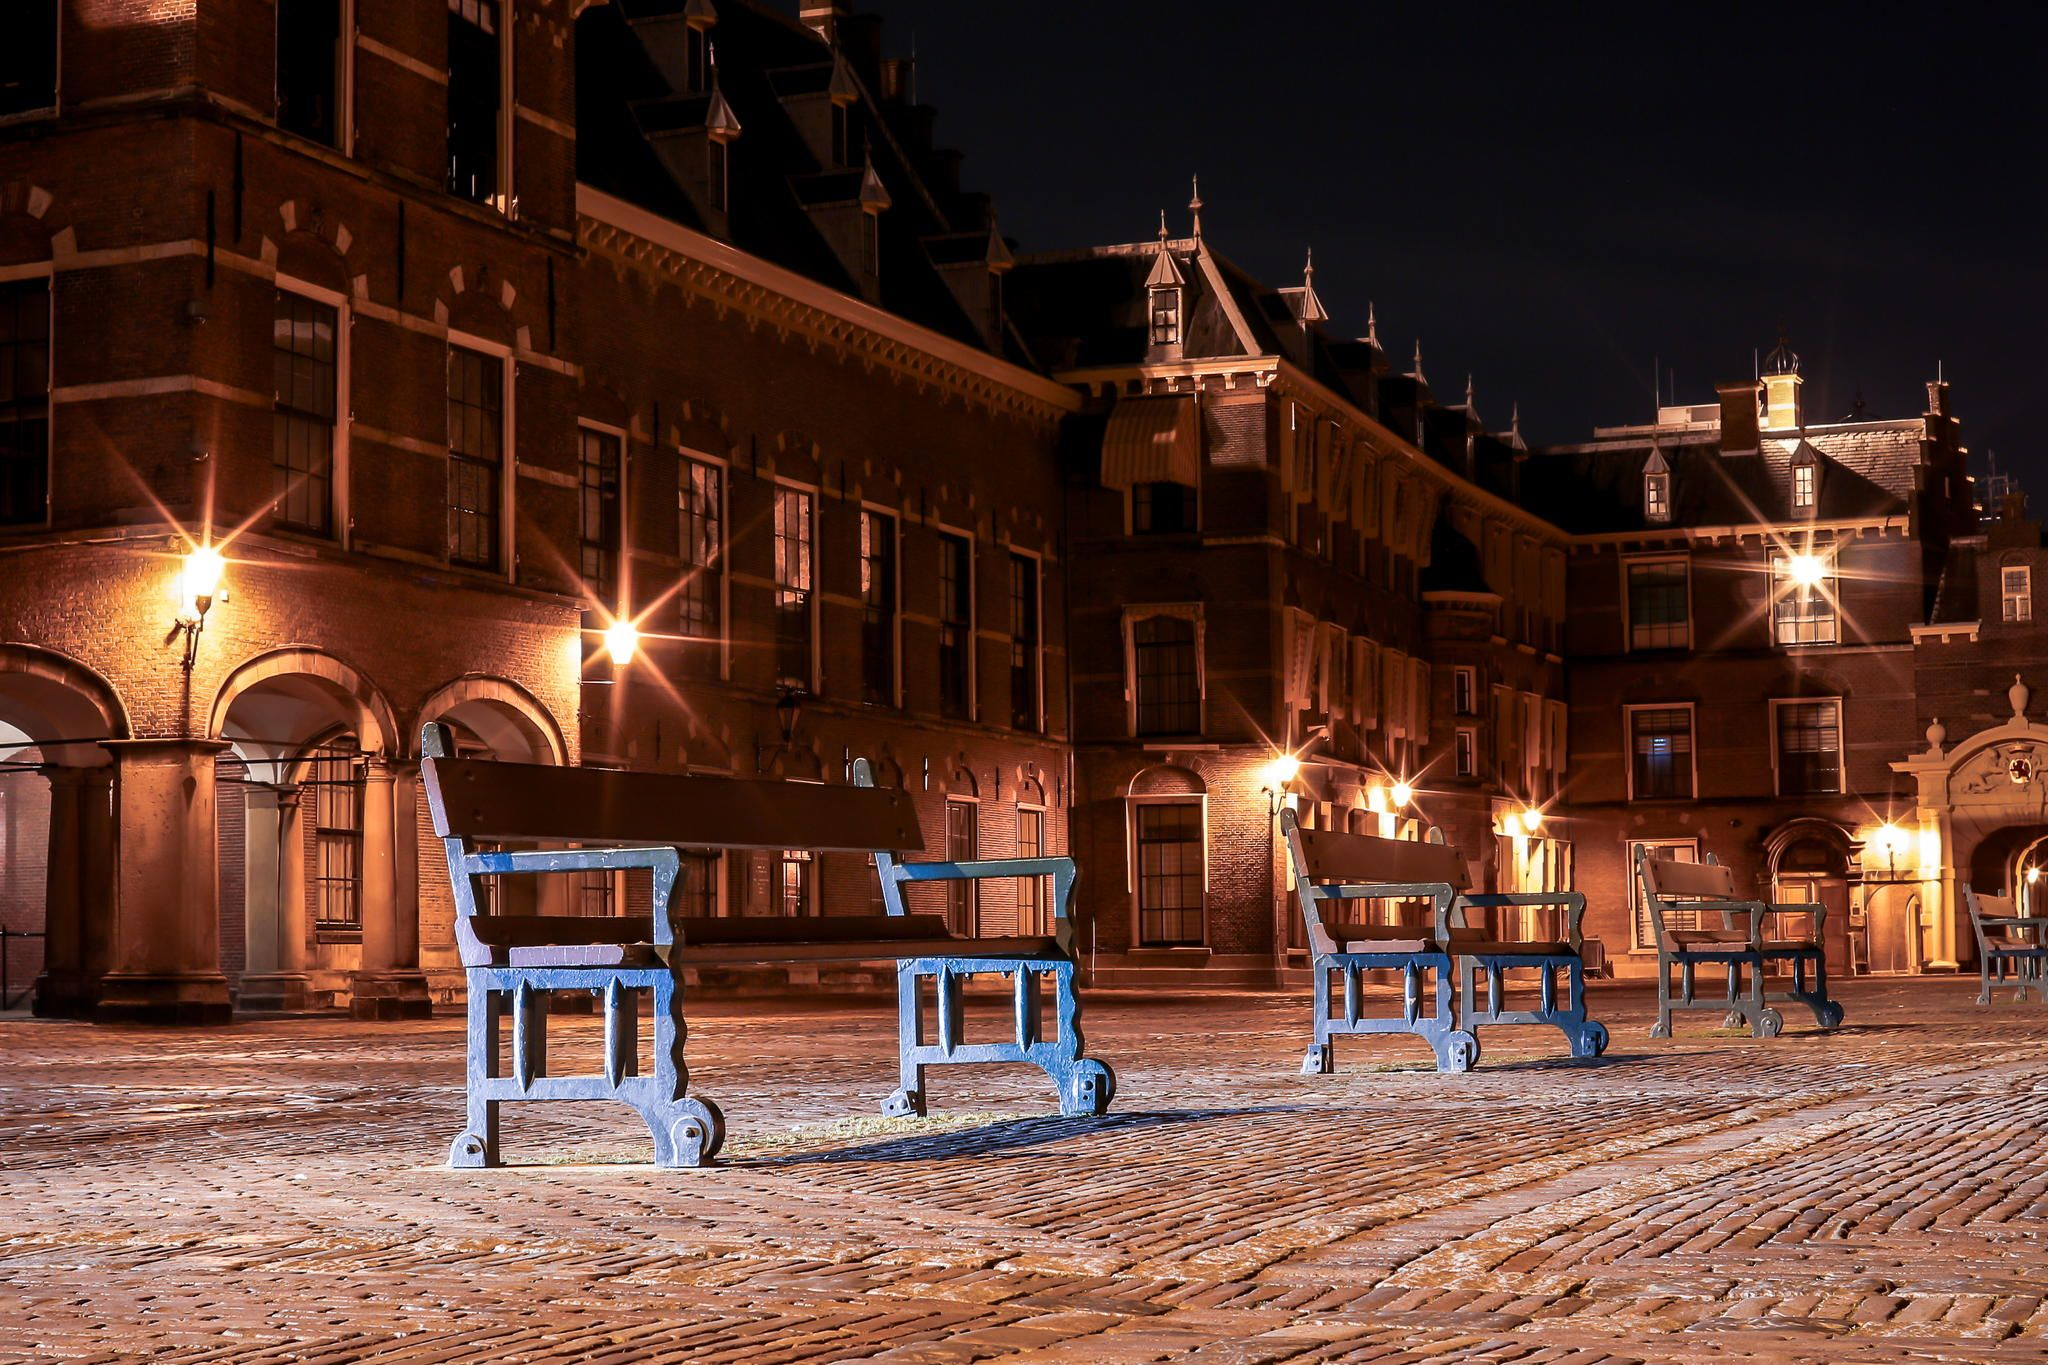 Seven lights of Binnenhof yard